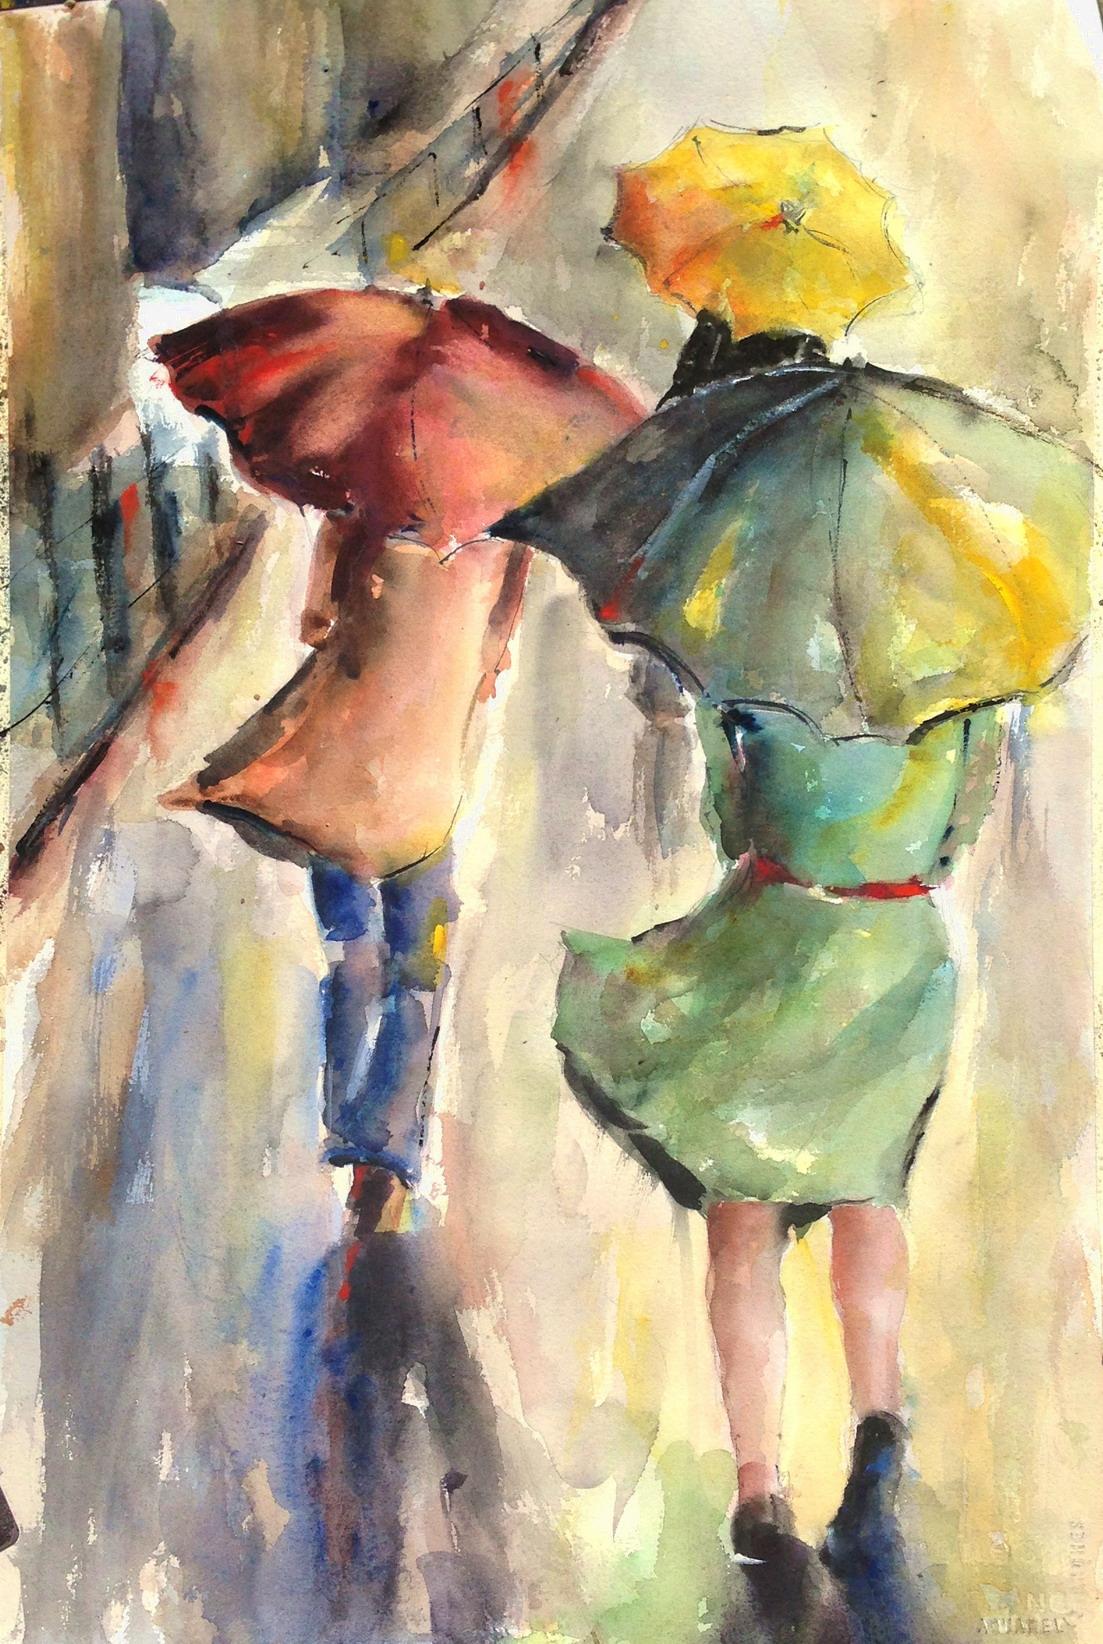 Demetra Kalams, watercolor, The New Zone Gallery 2